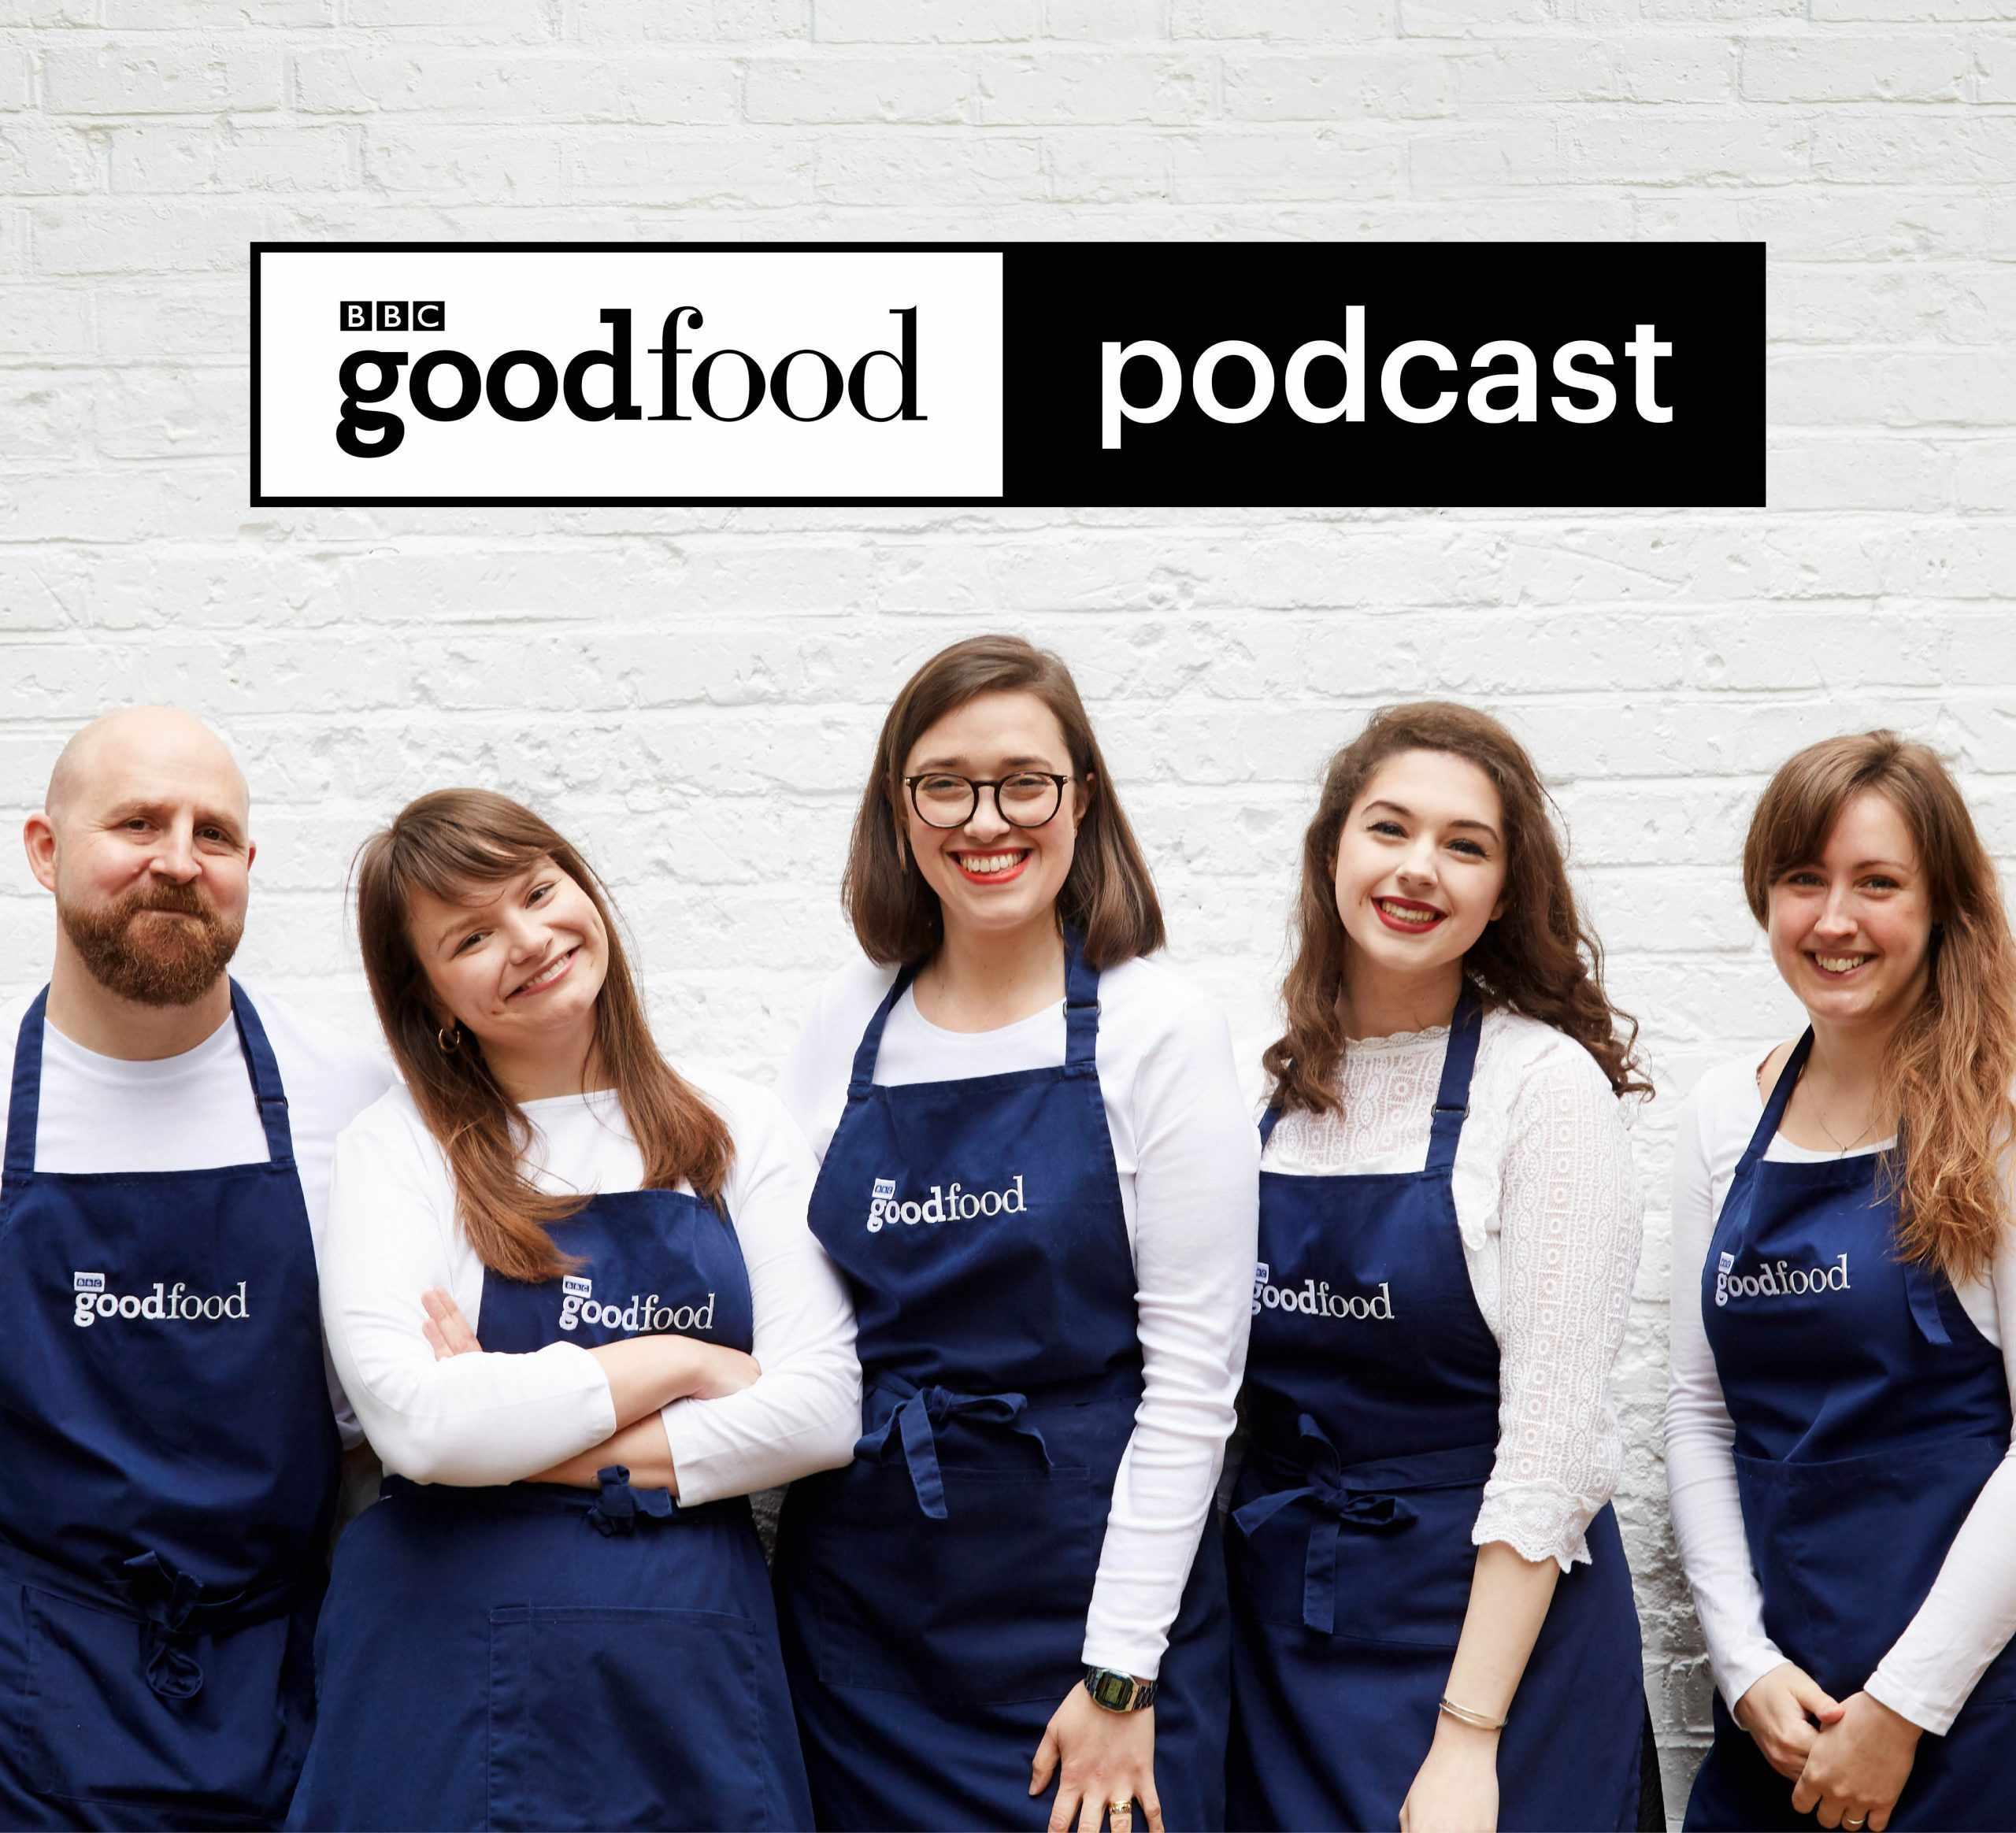 BBC Good Food podcast